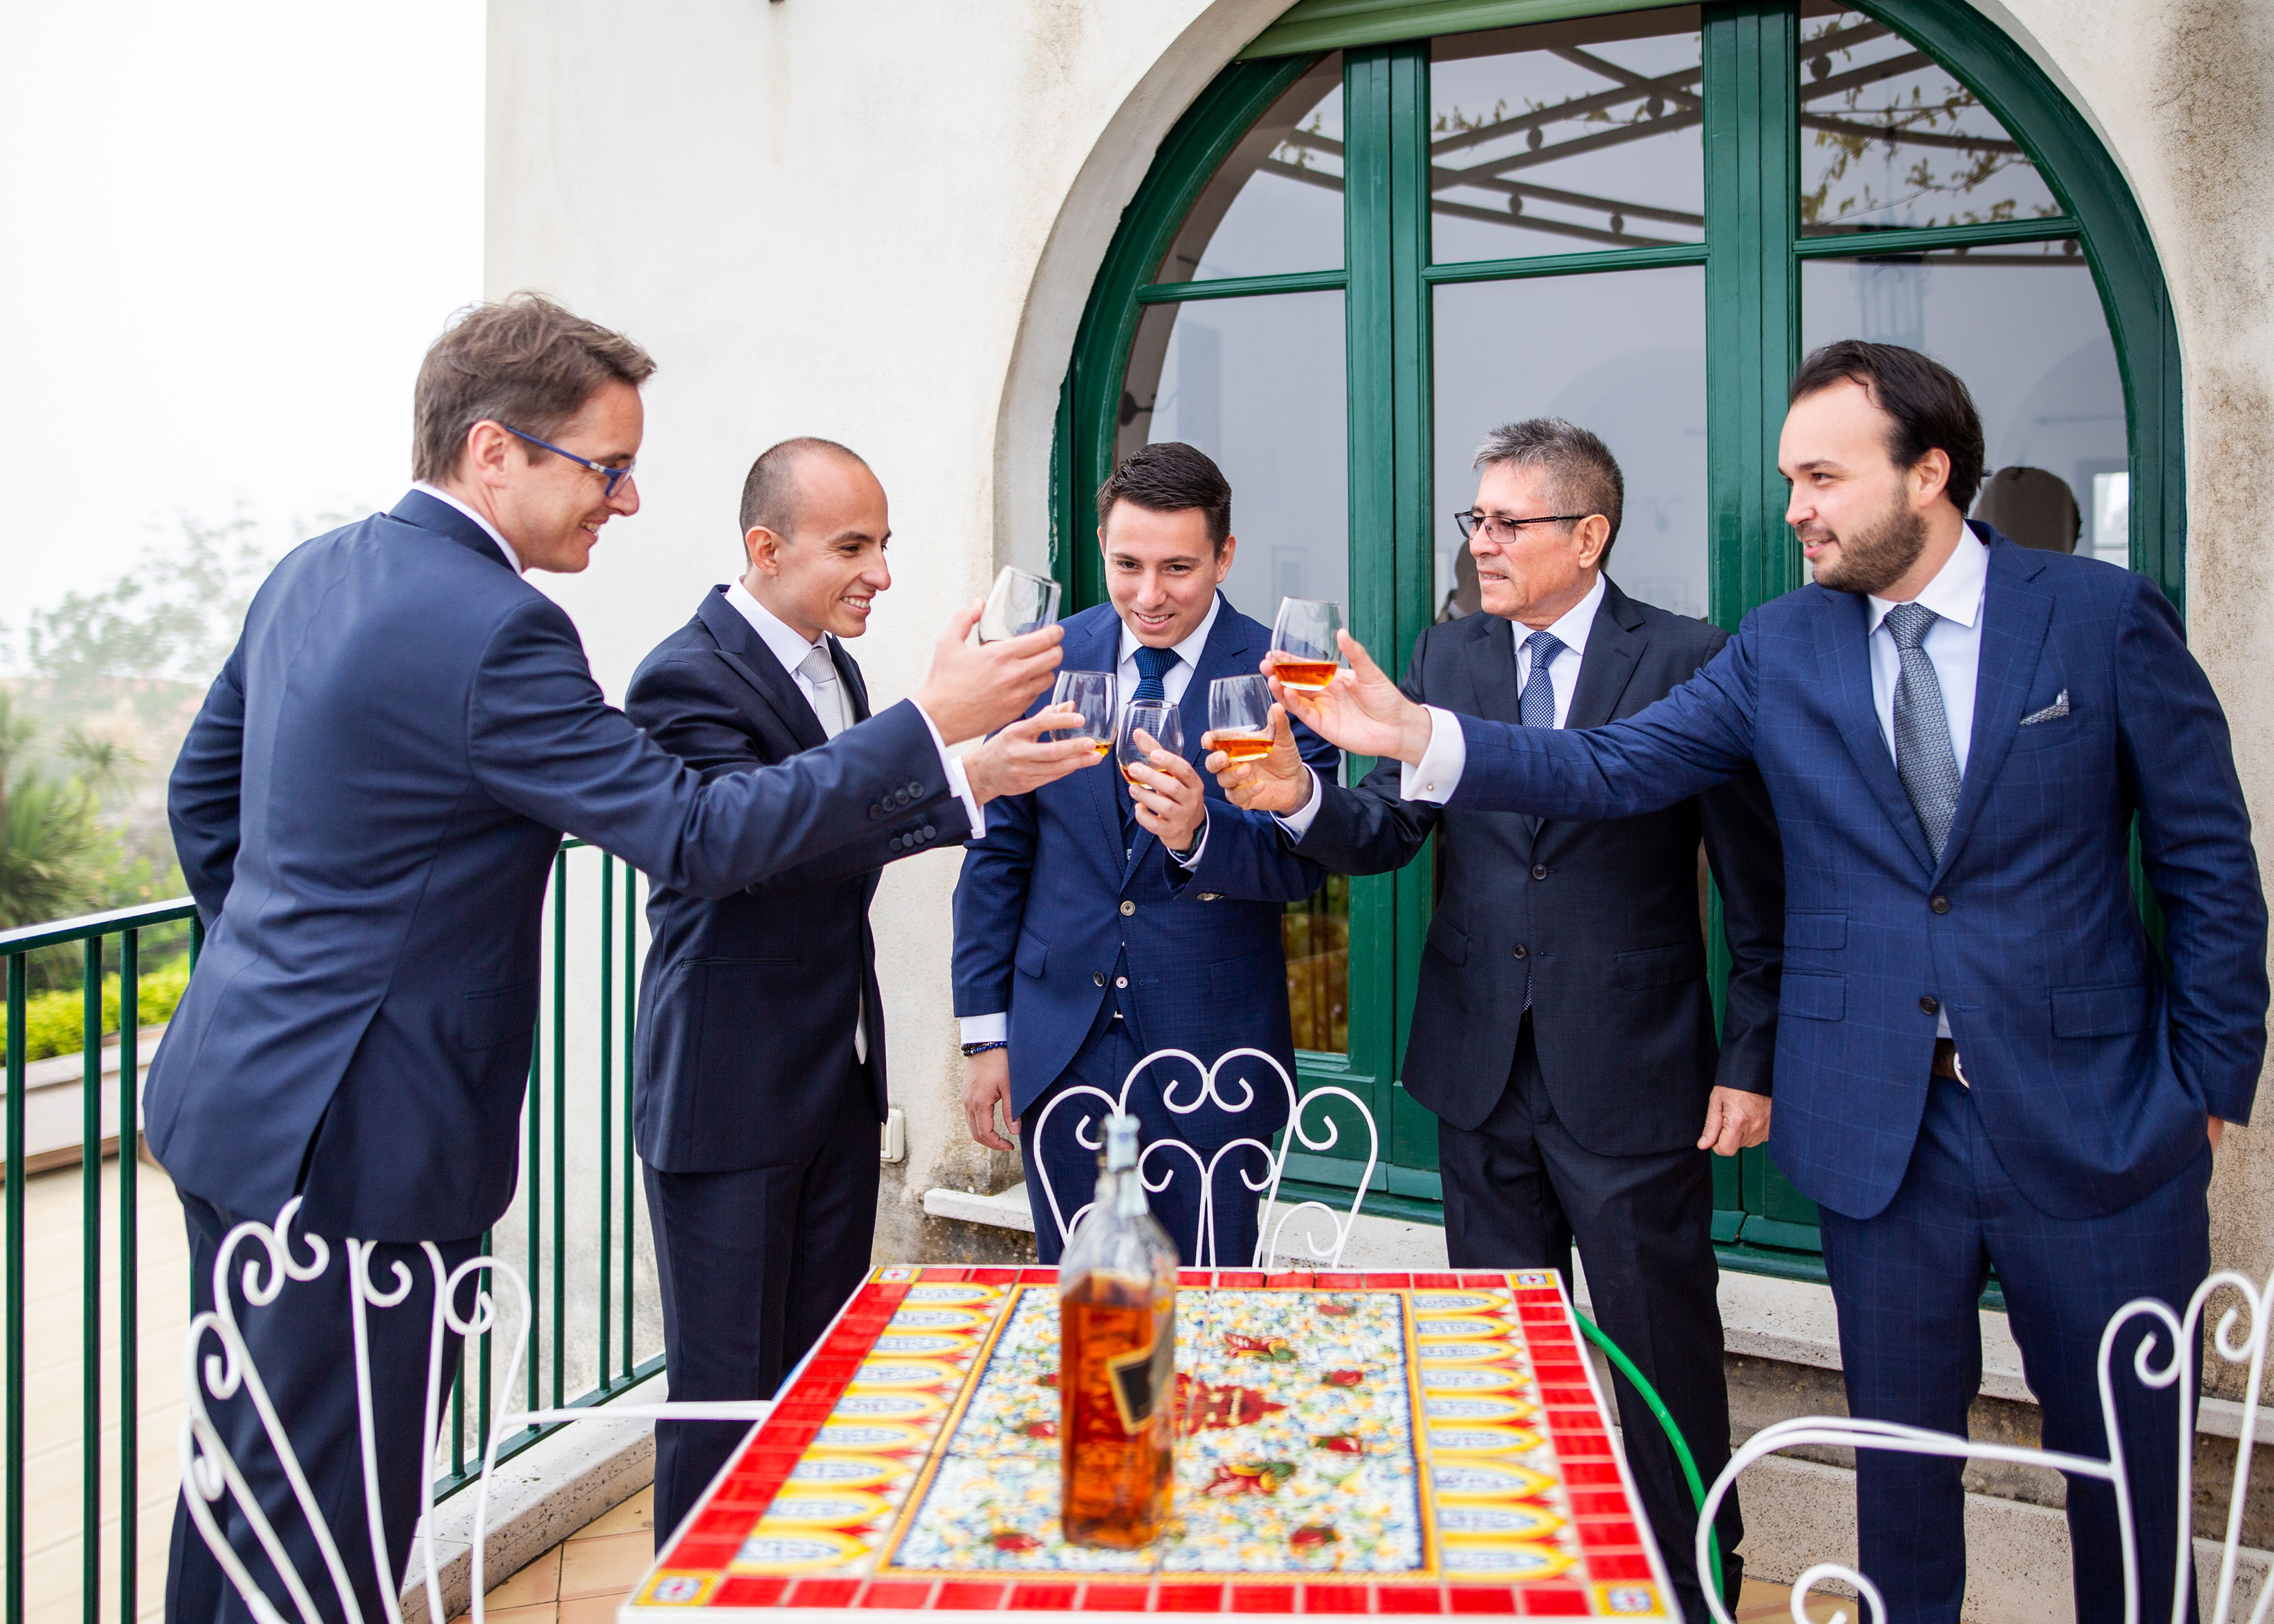 http://www.weddingamalfi.com/wp-content/uploads/Katia-Jorge-18-maggio-2019-6.jpg